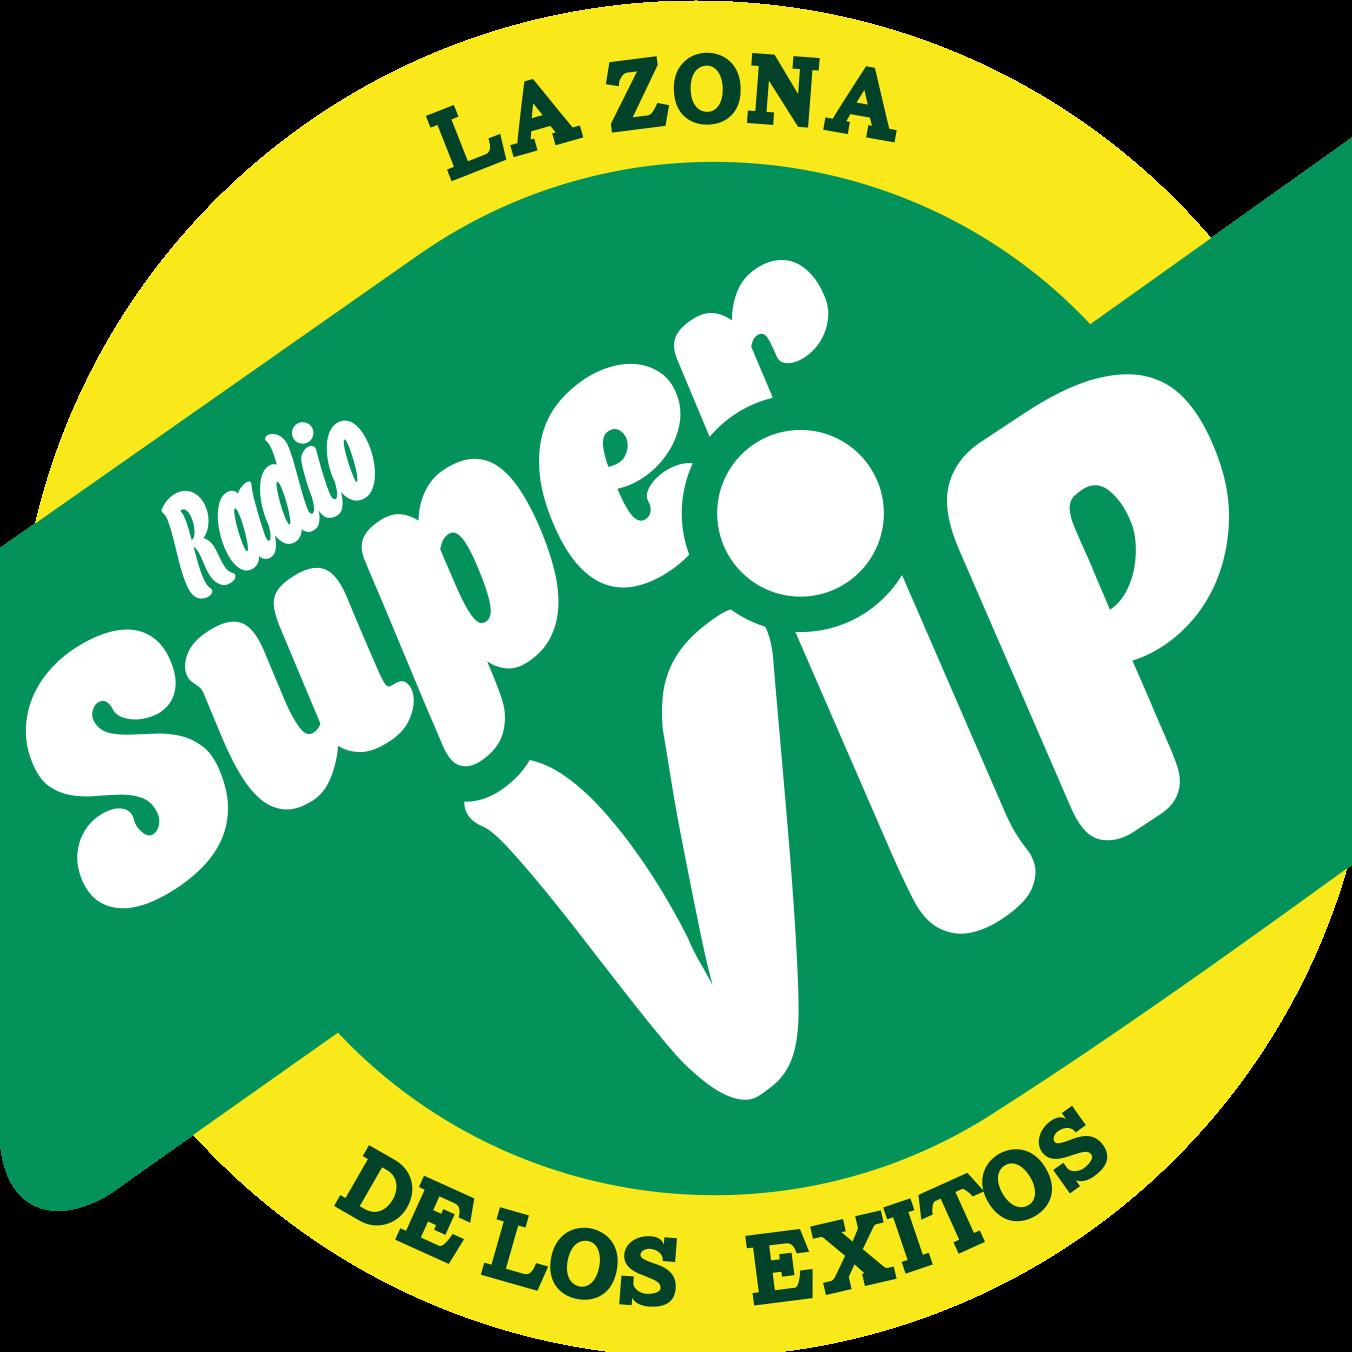 super-vip live